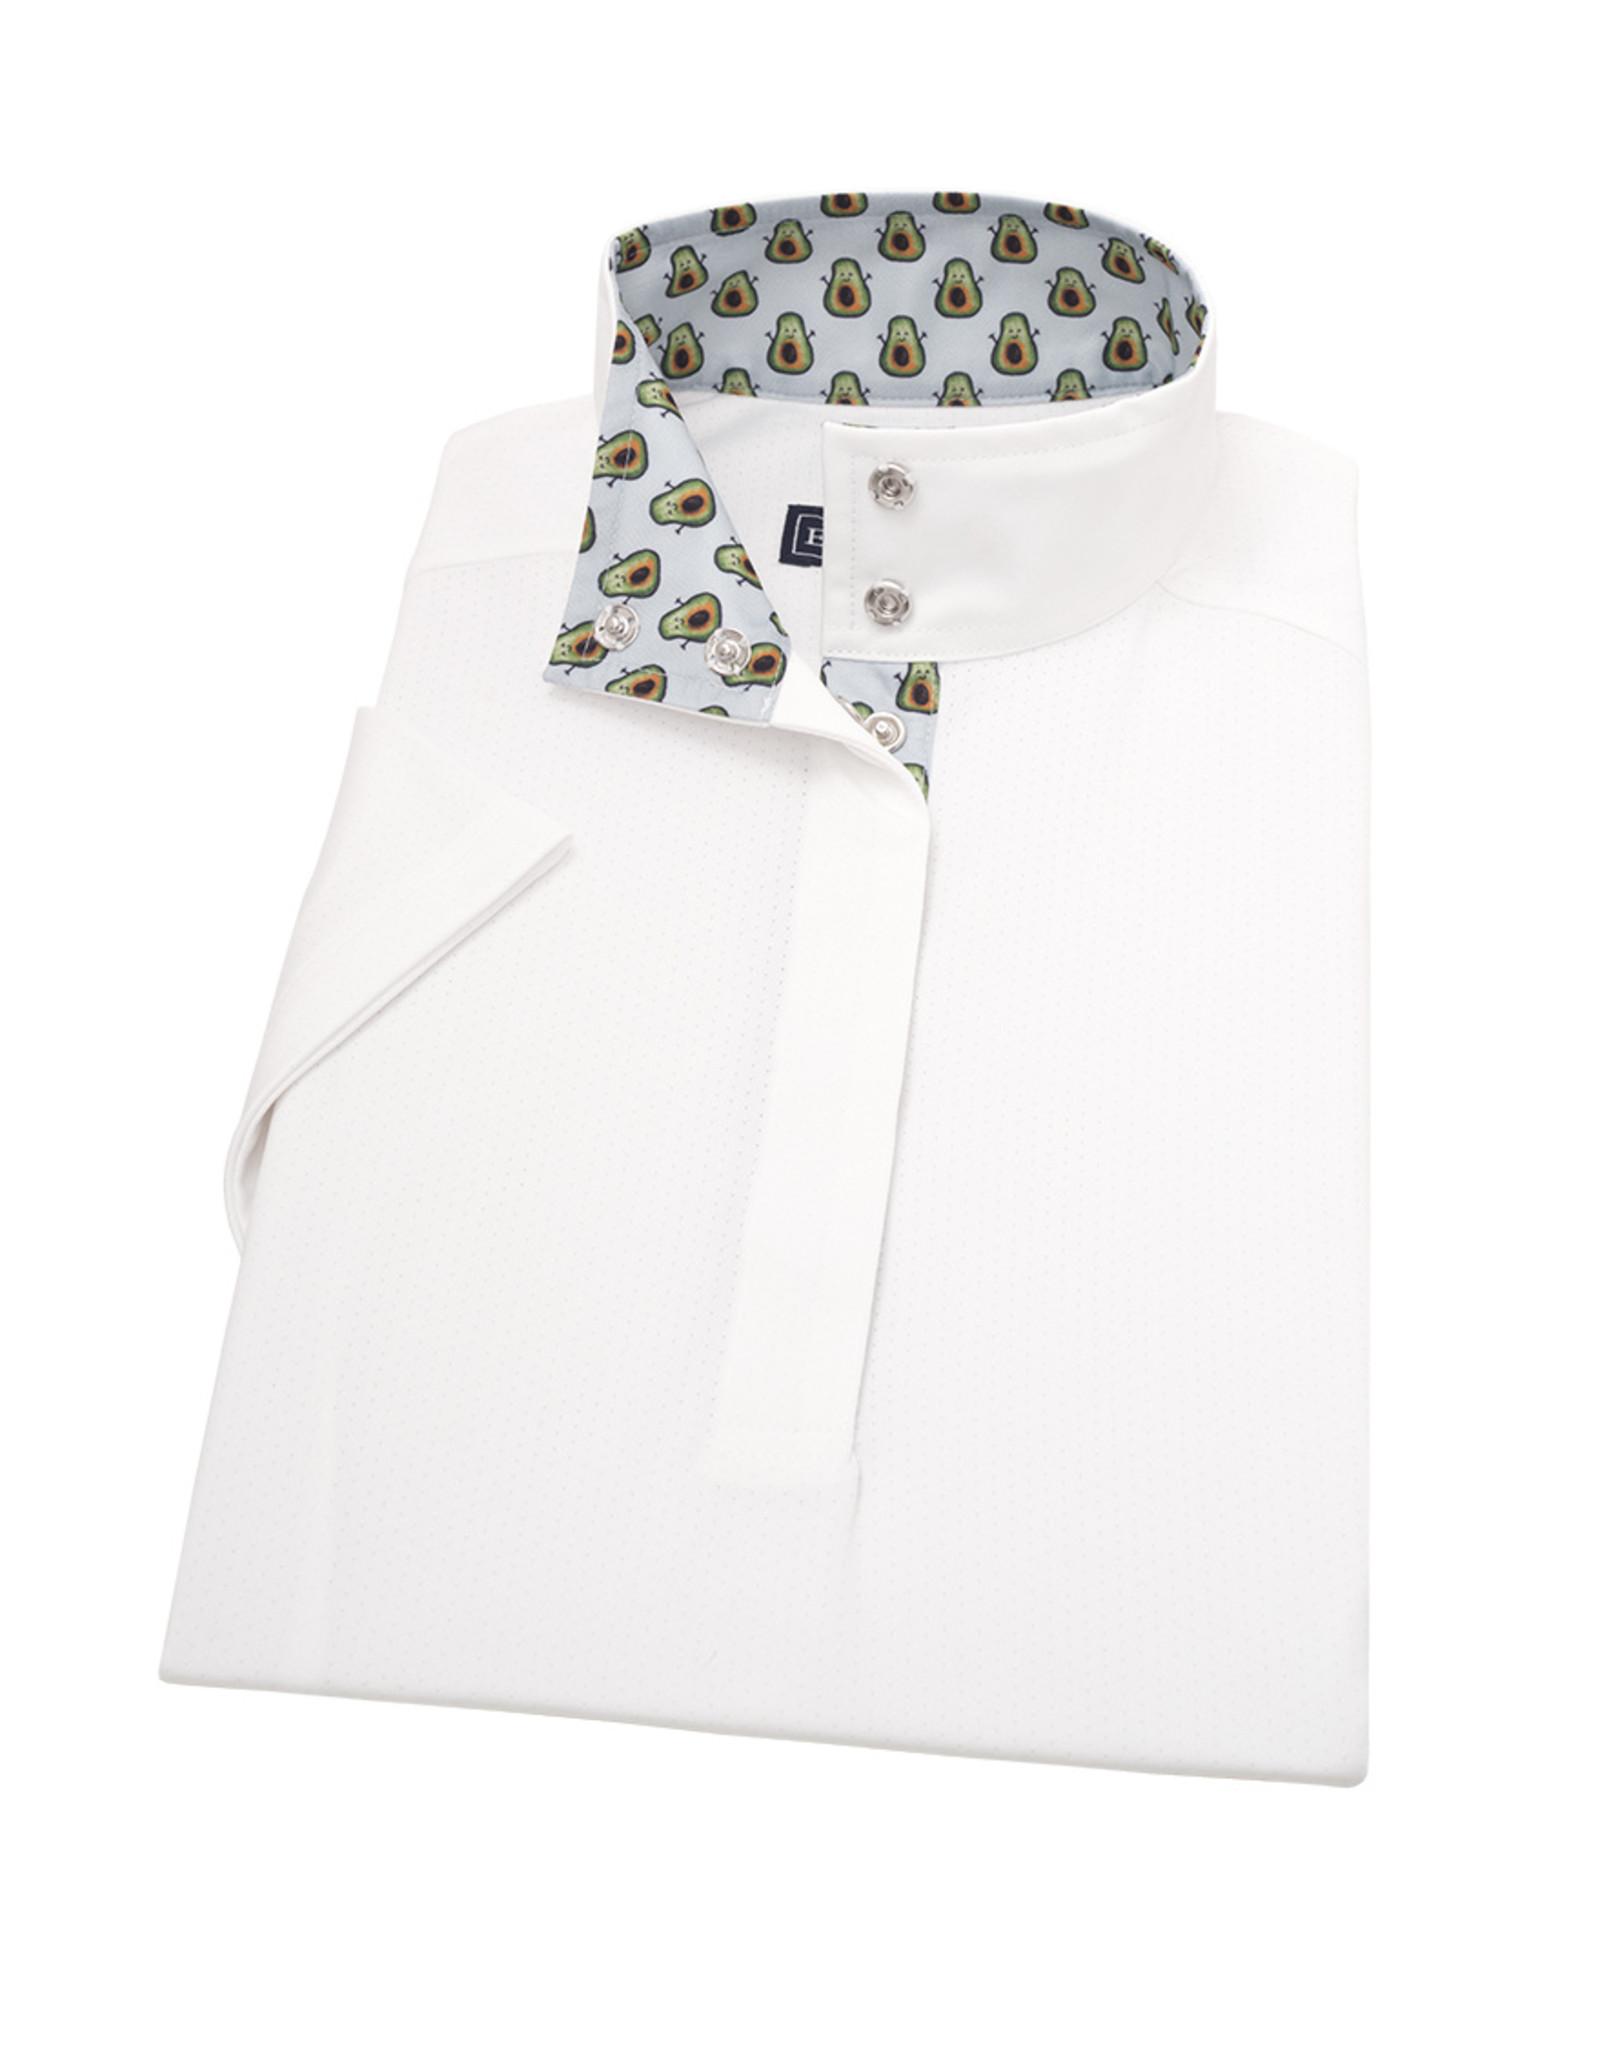 Essex Ladies Short Sleeve standard collar